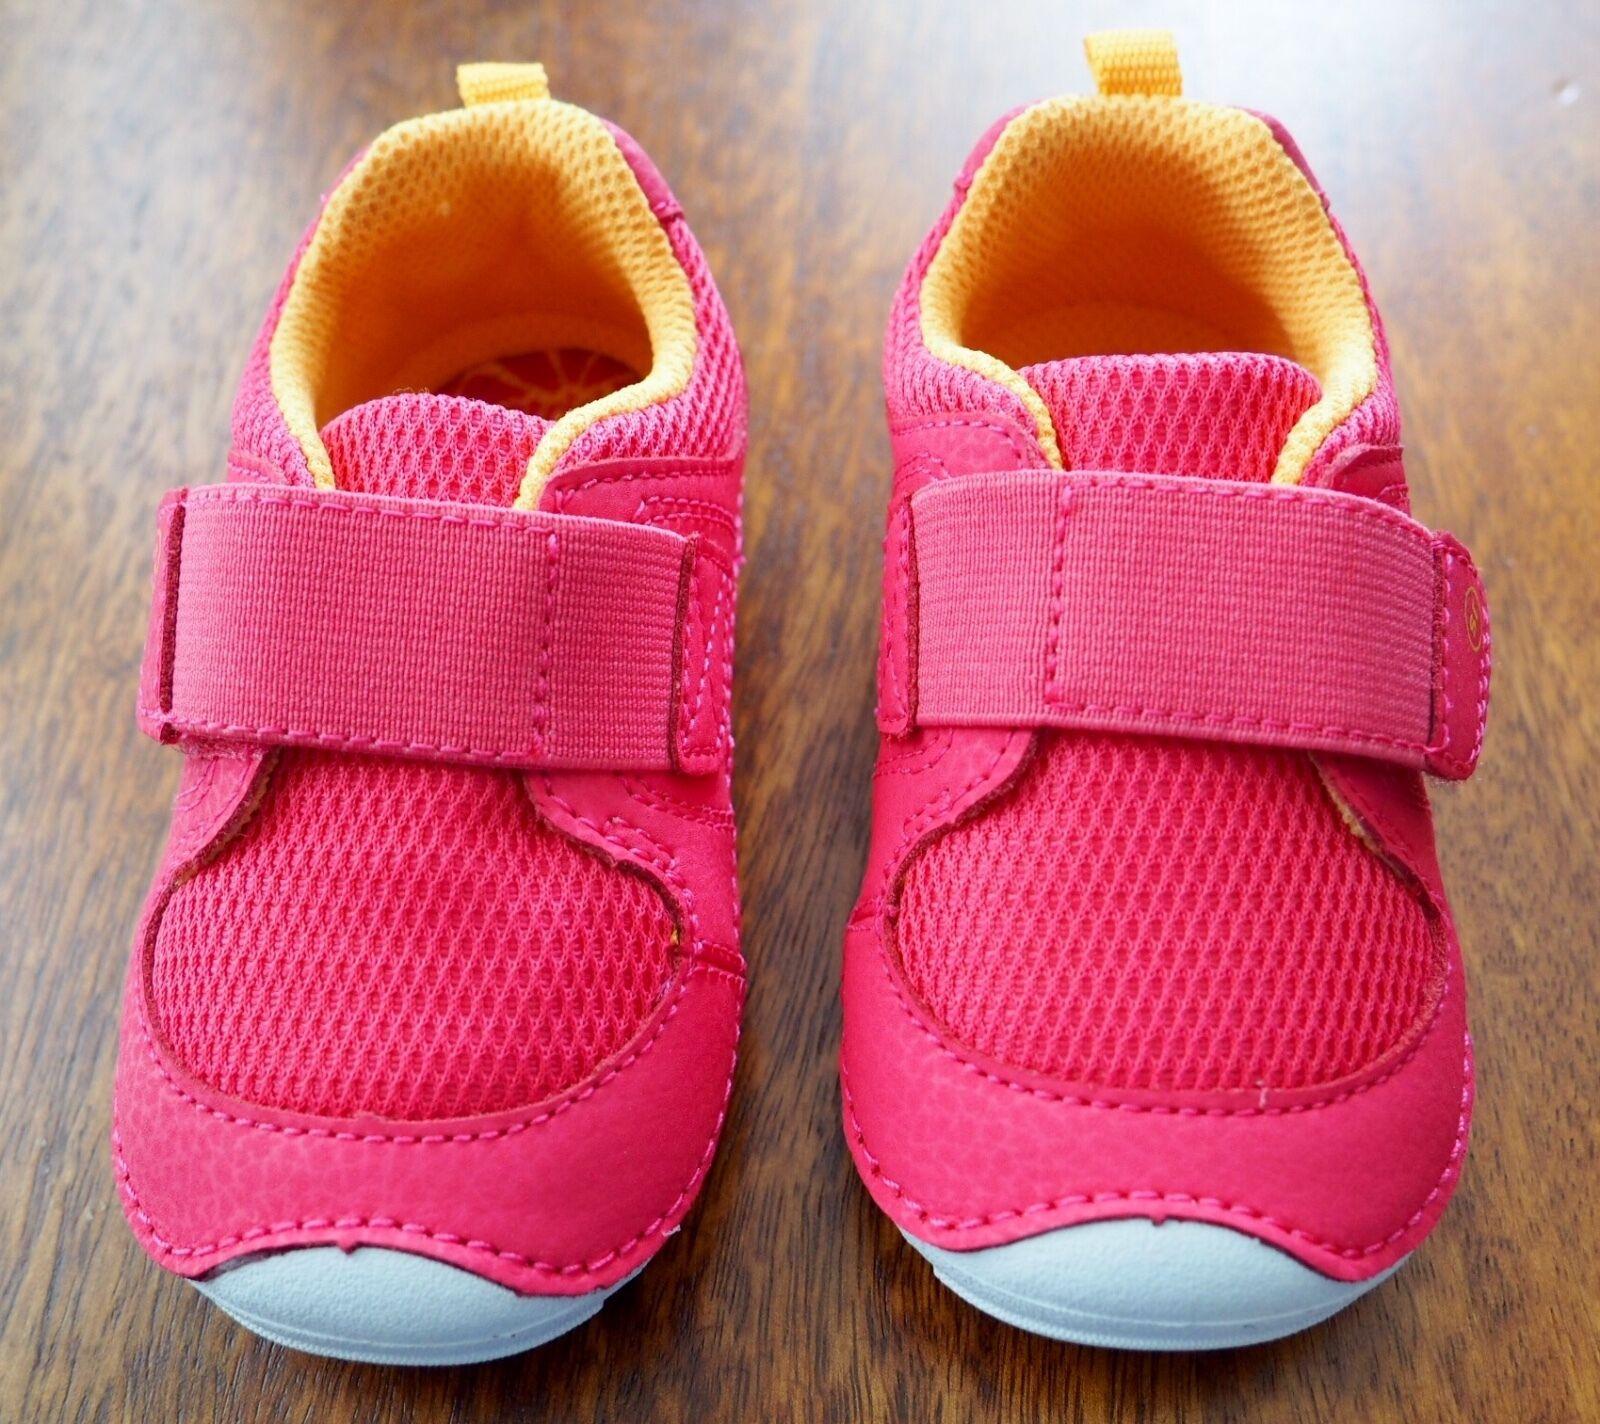 NEW STRIDE RITE Soft Motion Kids Ripley Sneaker Girl - Pink